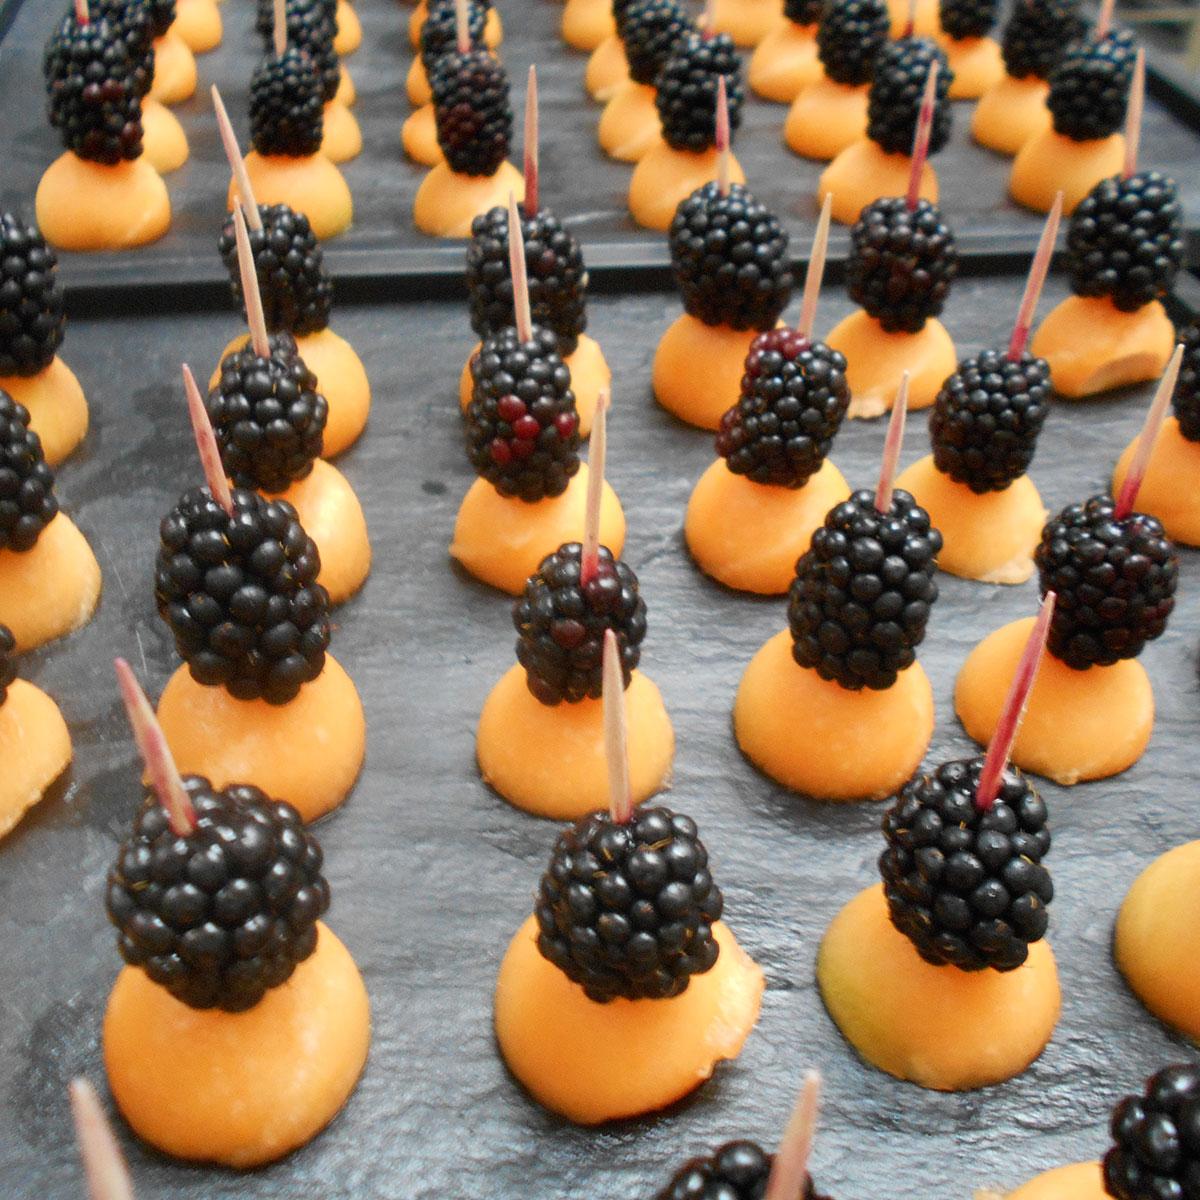 Buffet frutta | Negriricevimenti.com